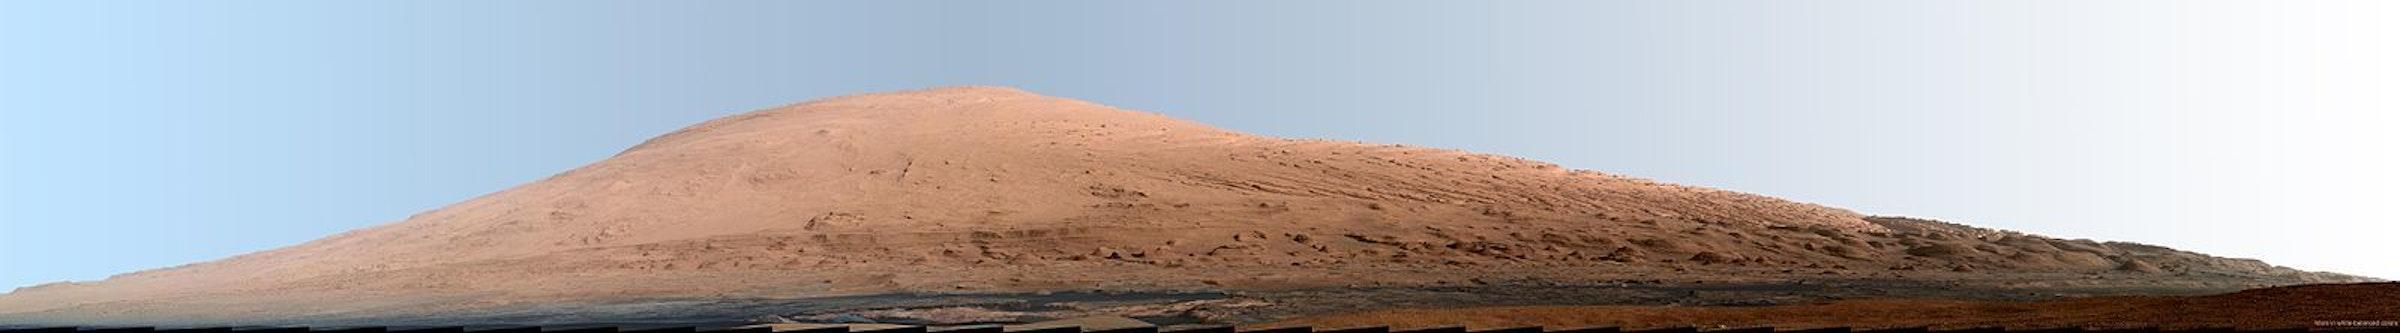 Mars' Mount Sharp